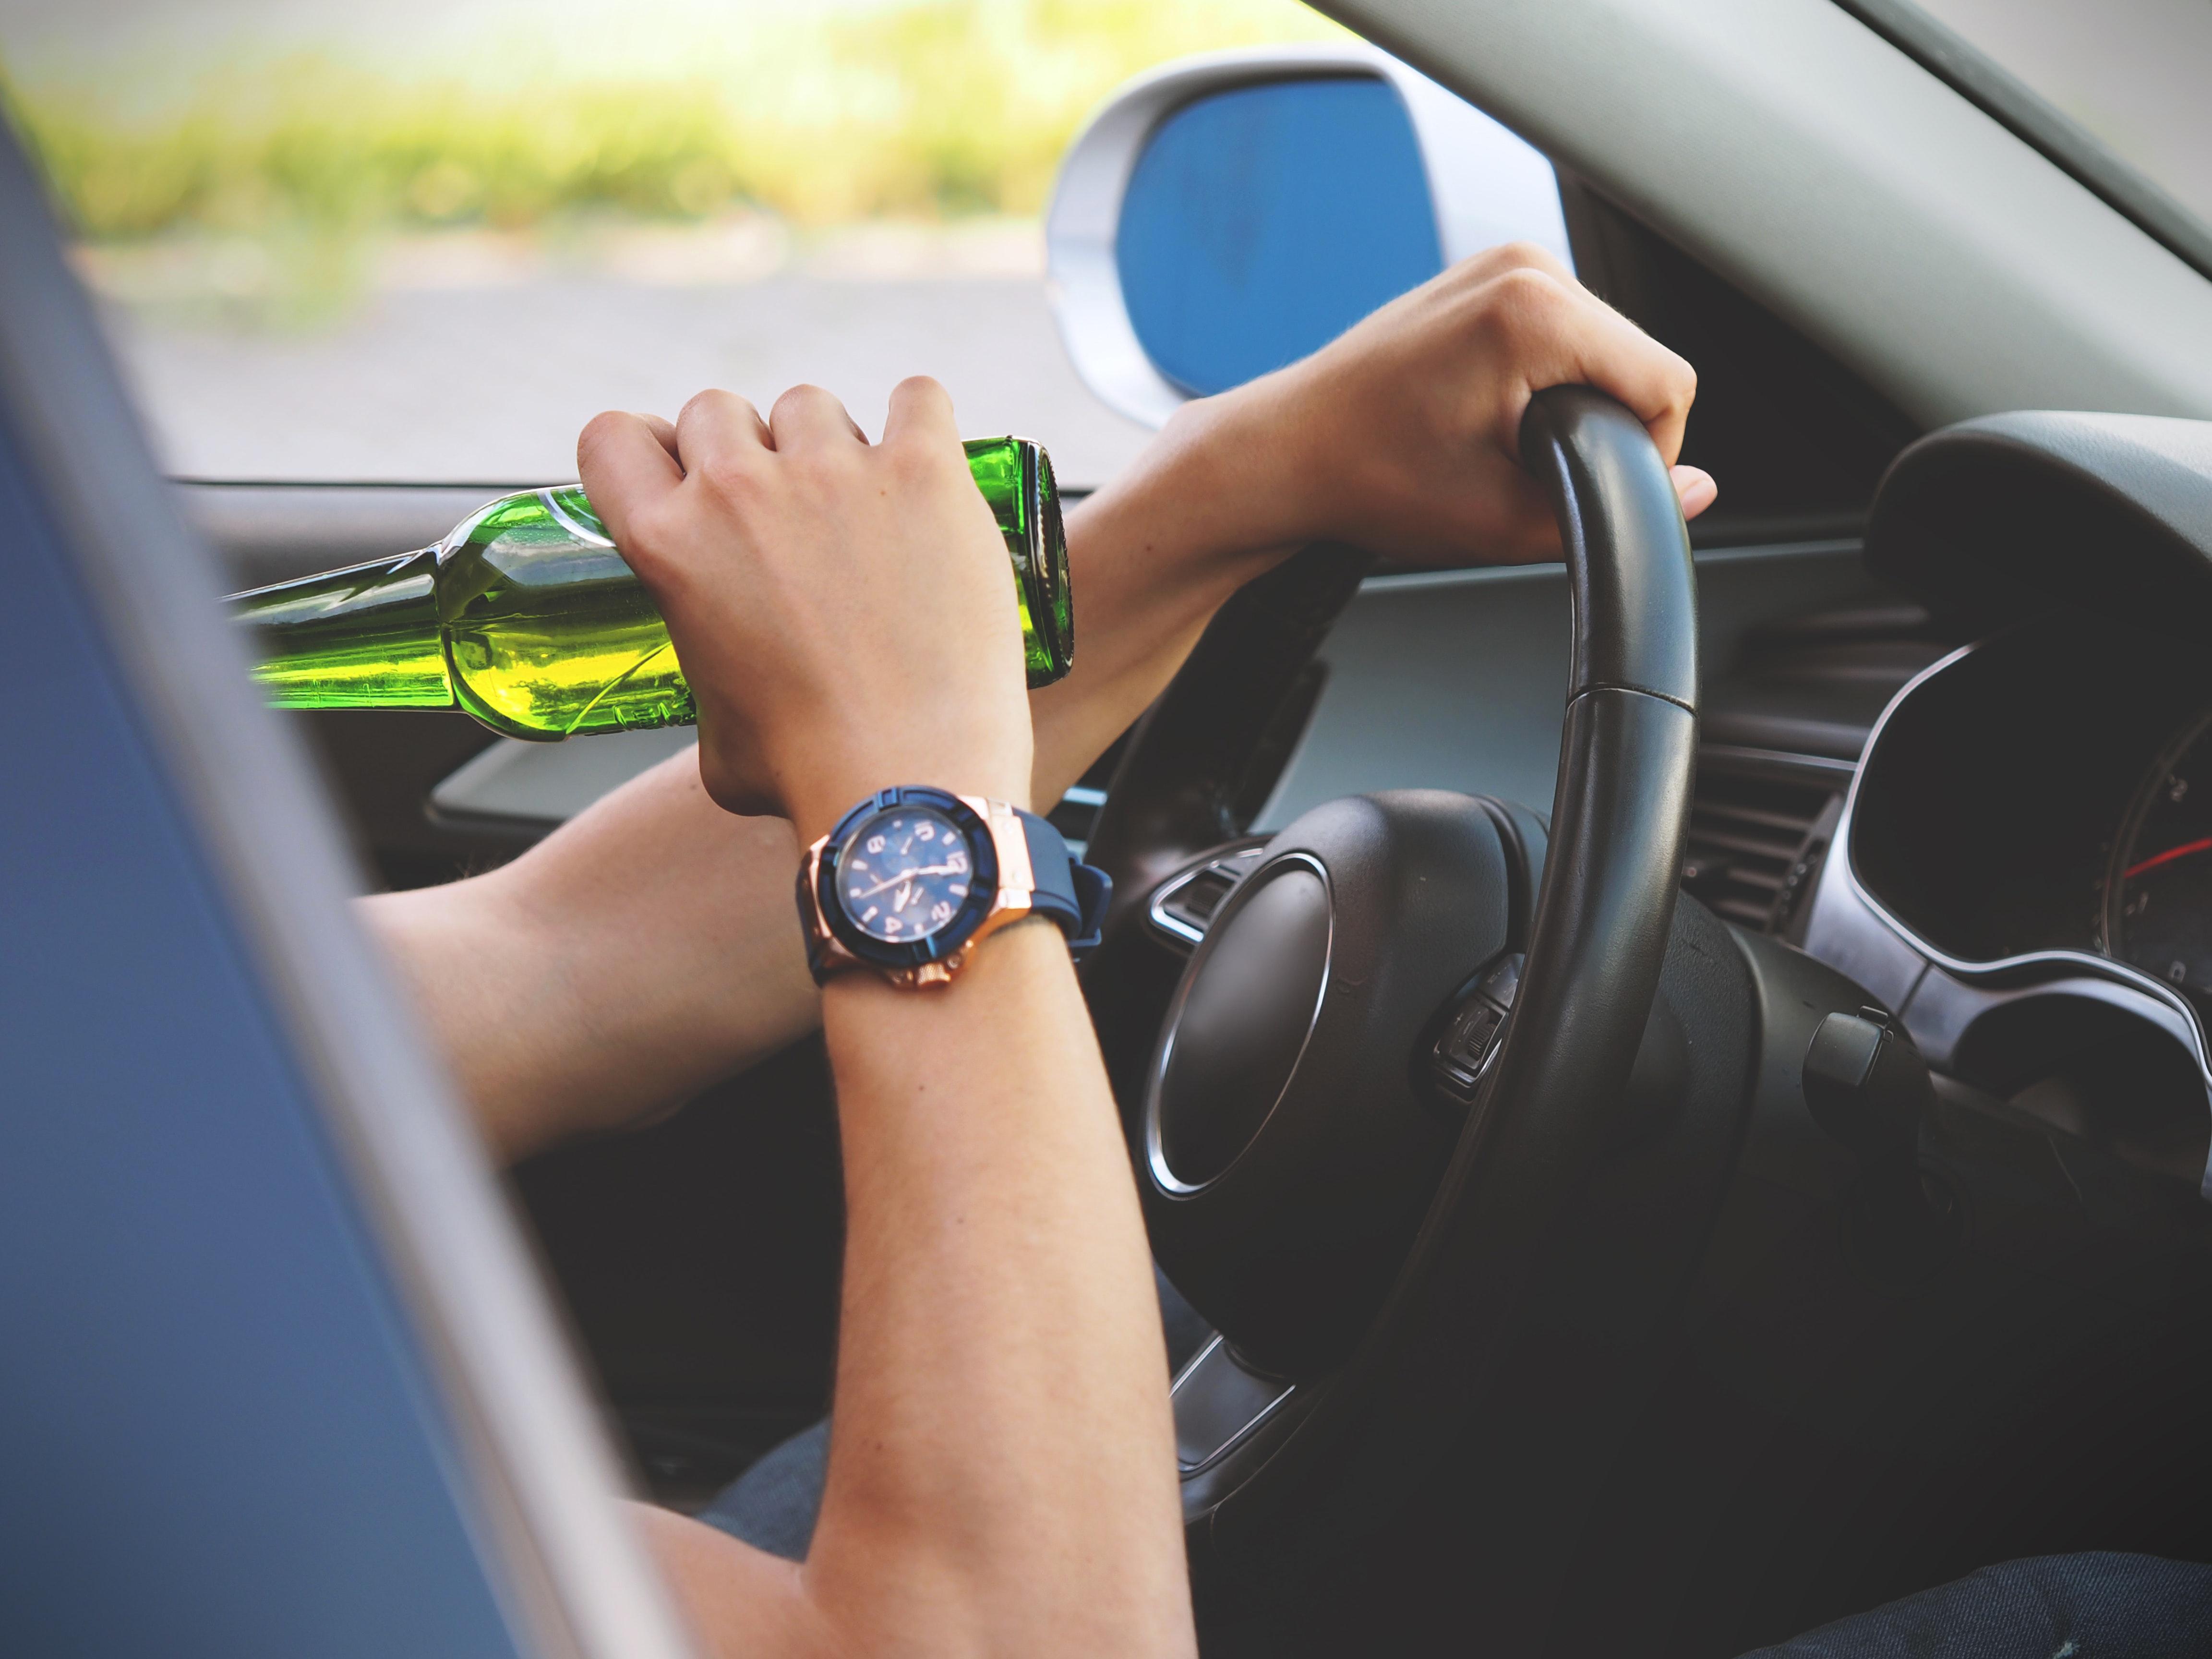 Alcool Au Volant >> Alcool Au Volant Saisie Du Vehicule Au Tournant Radio Taiwan